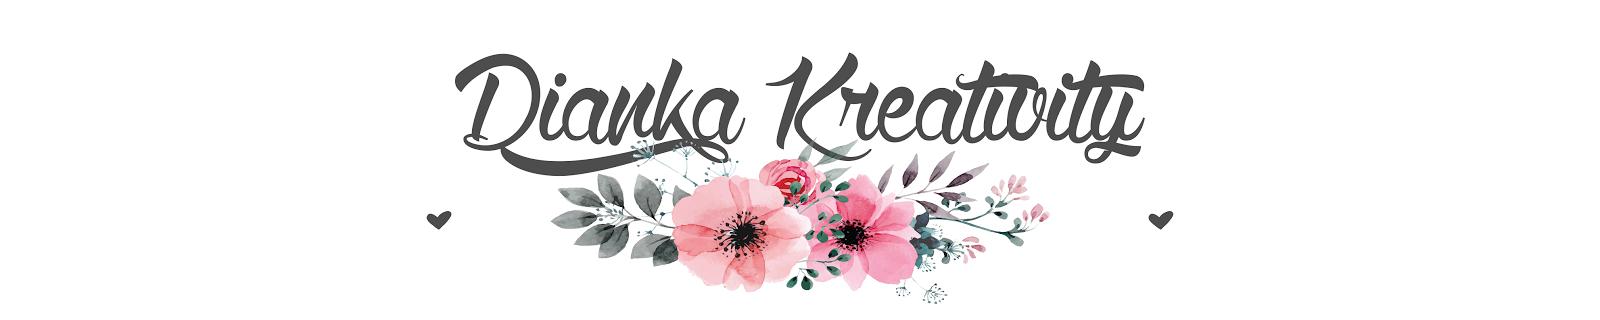 Dianka Kreativity